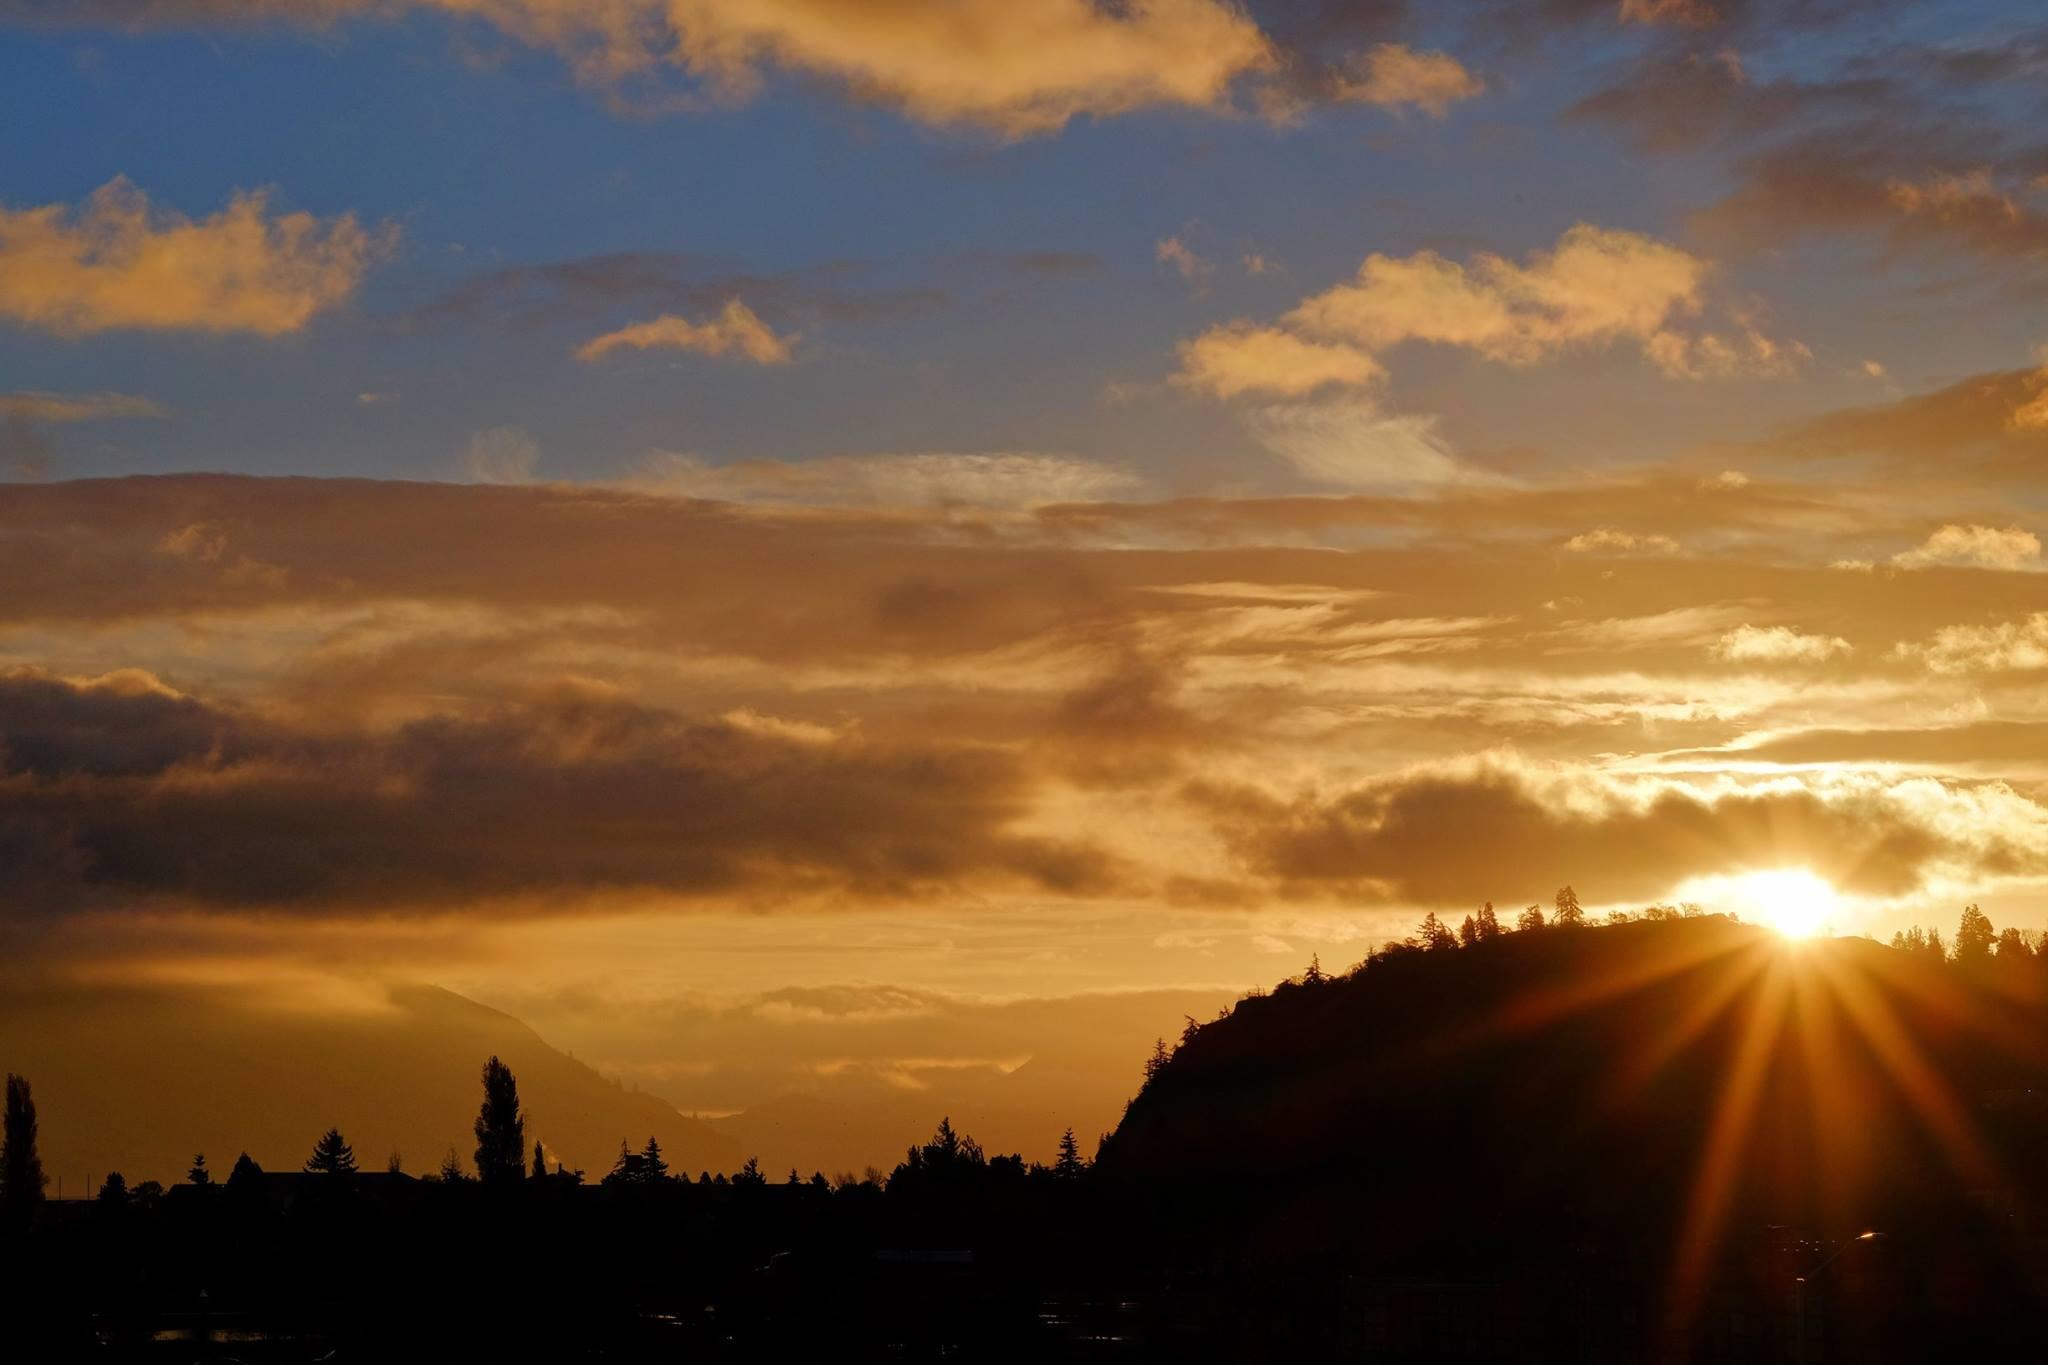 Columbia Gorge at sunrise